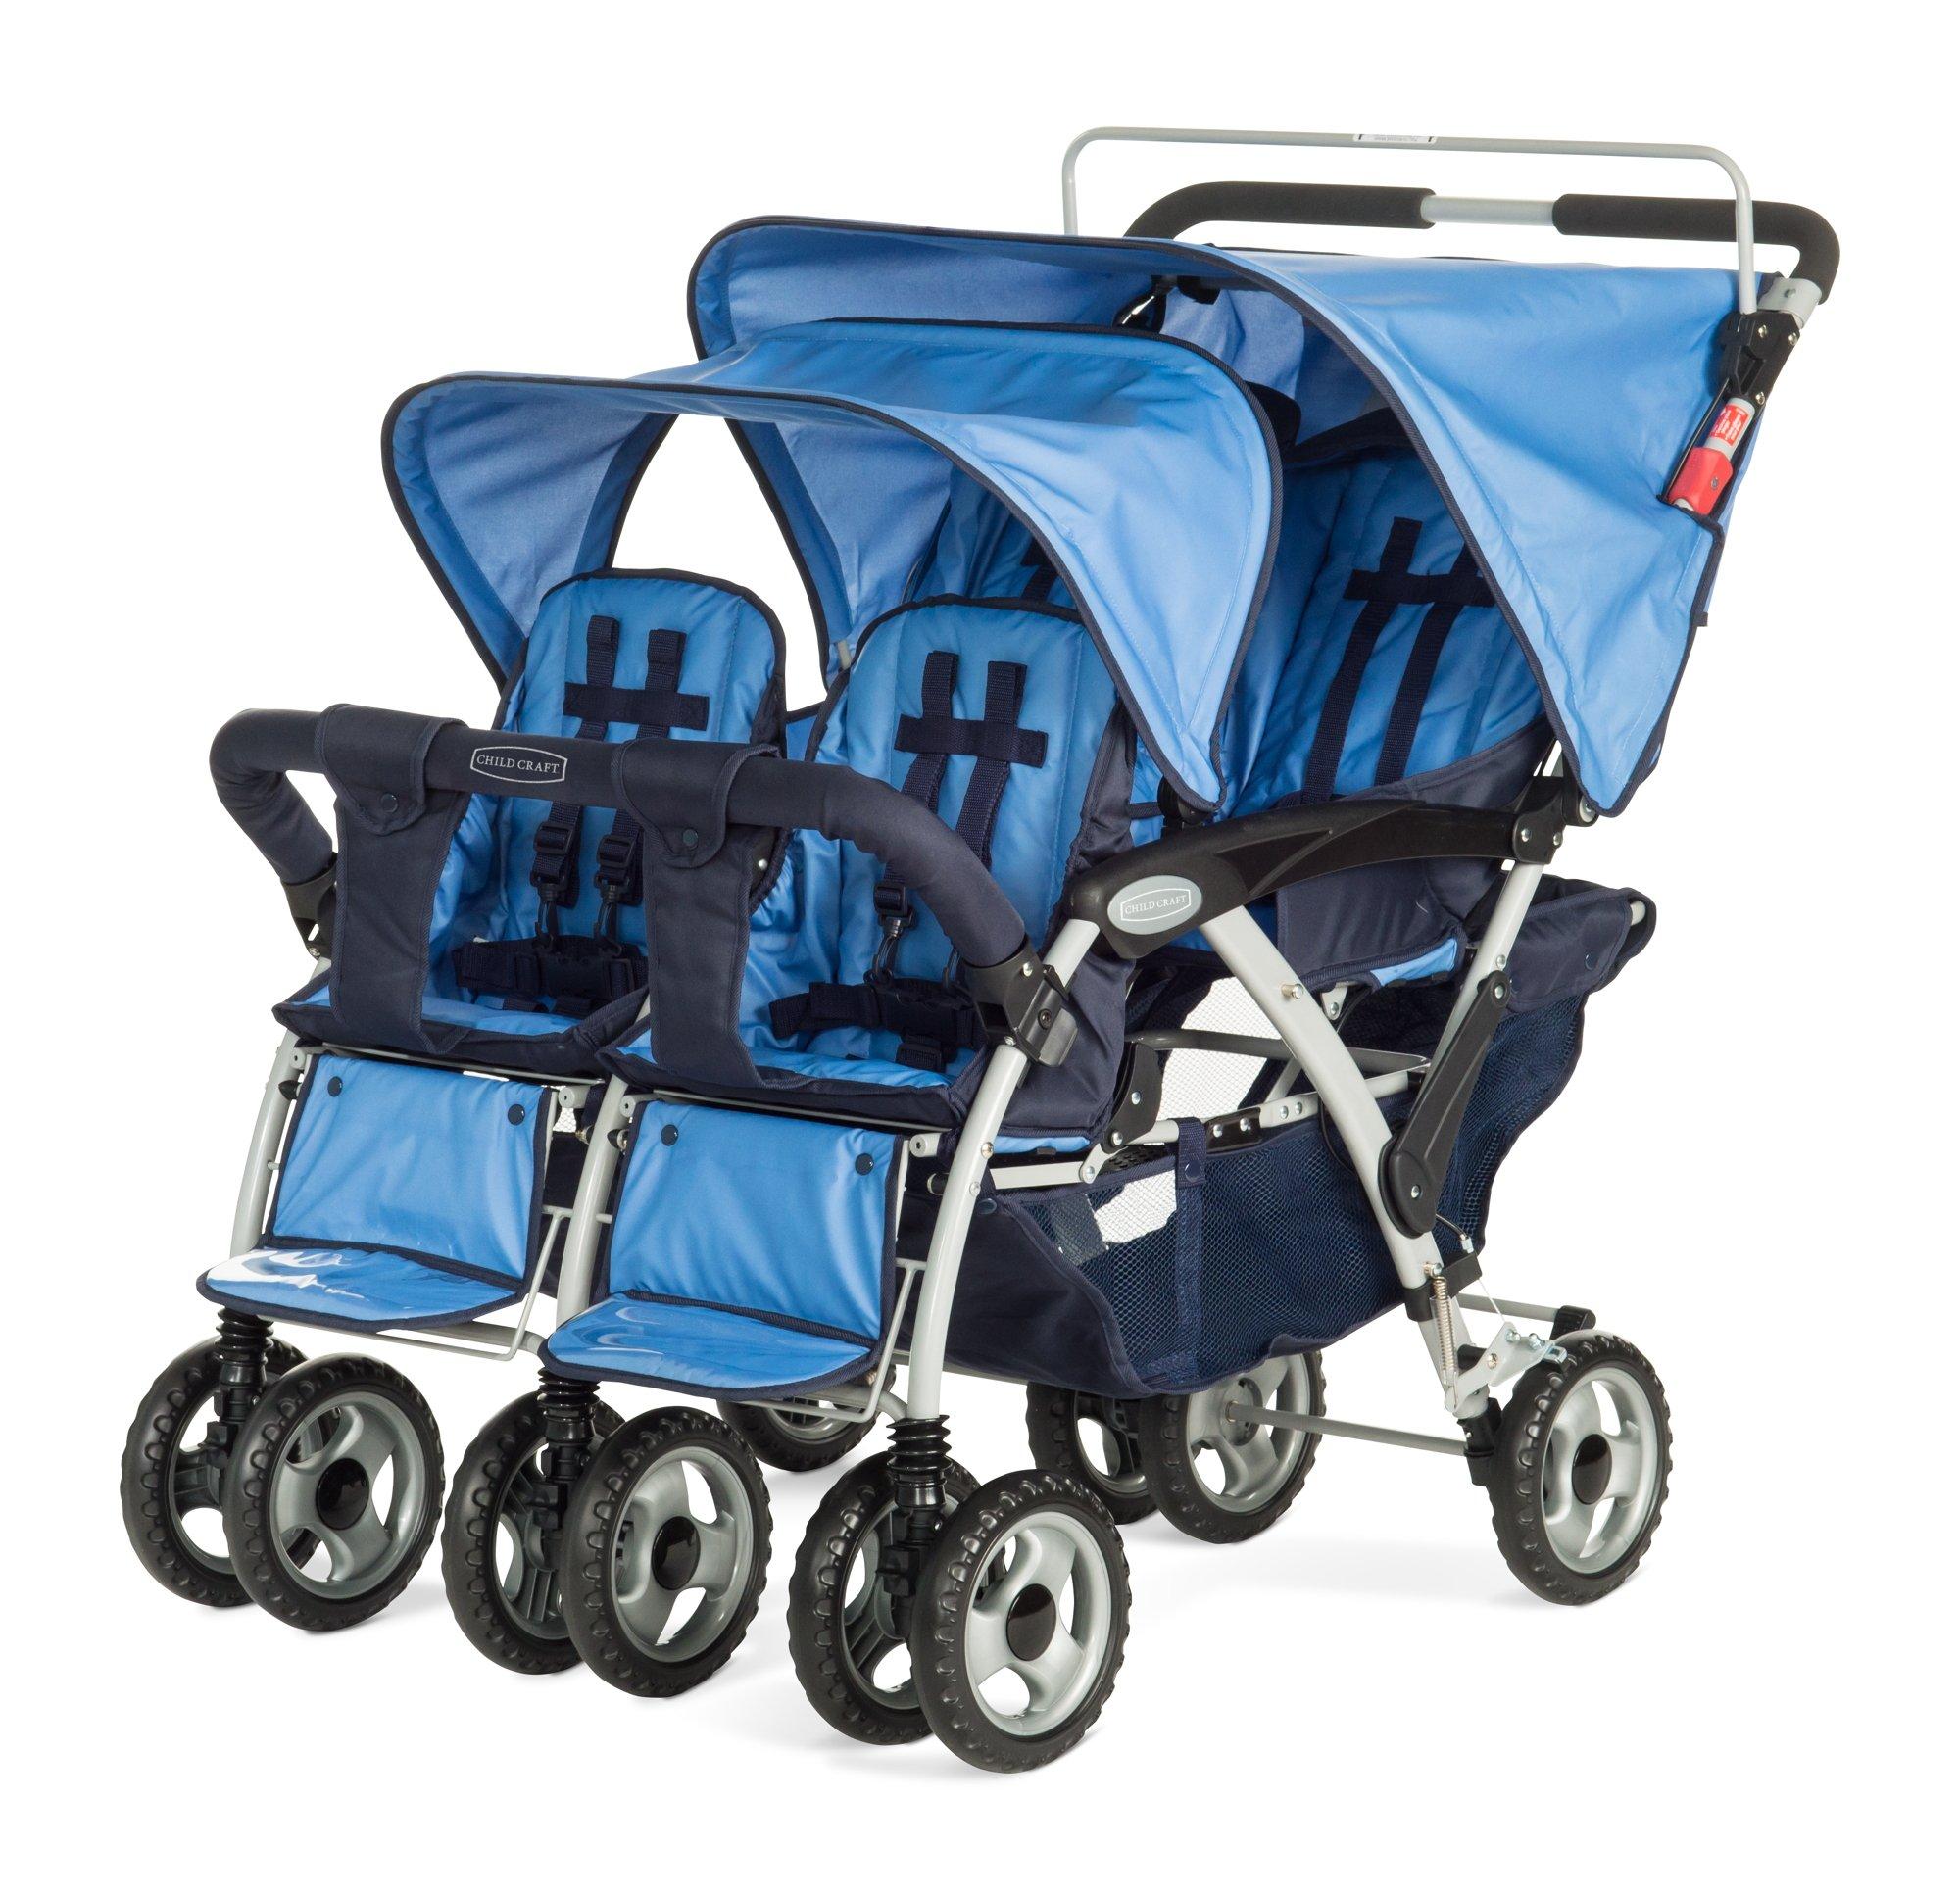 Child Craft Sport Multi-Child Quad Stroller, Regatta Blue